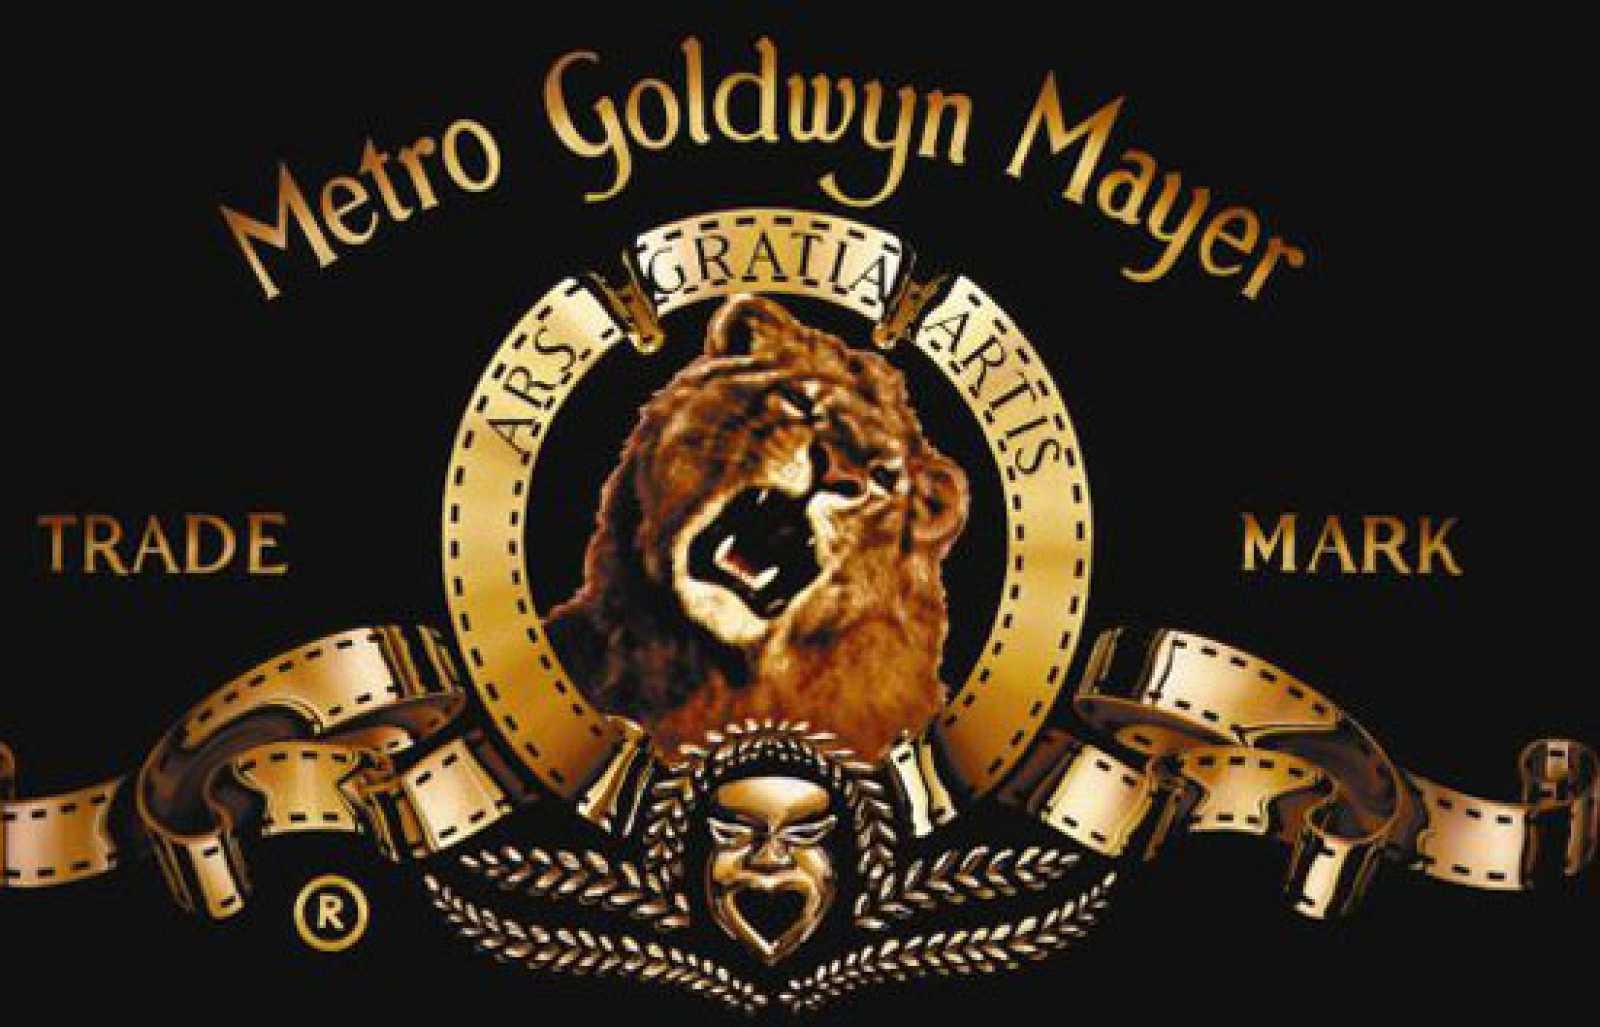 Resultado de imagen para metro golden mayer lion